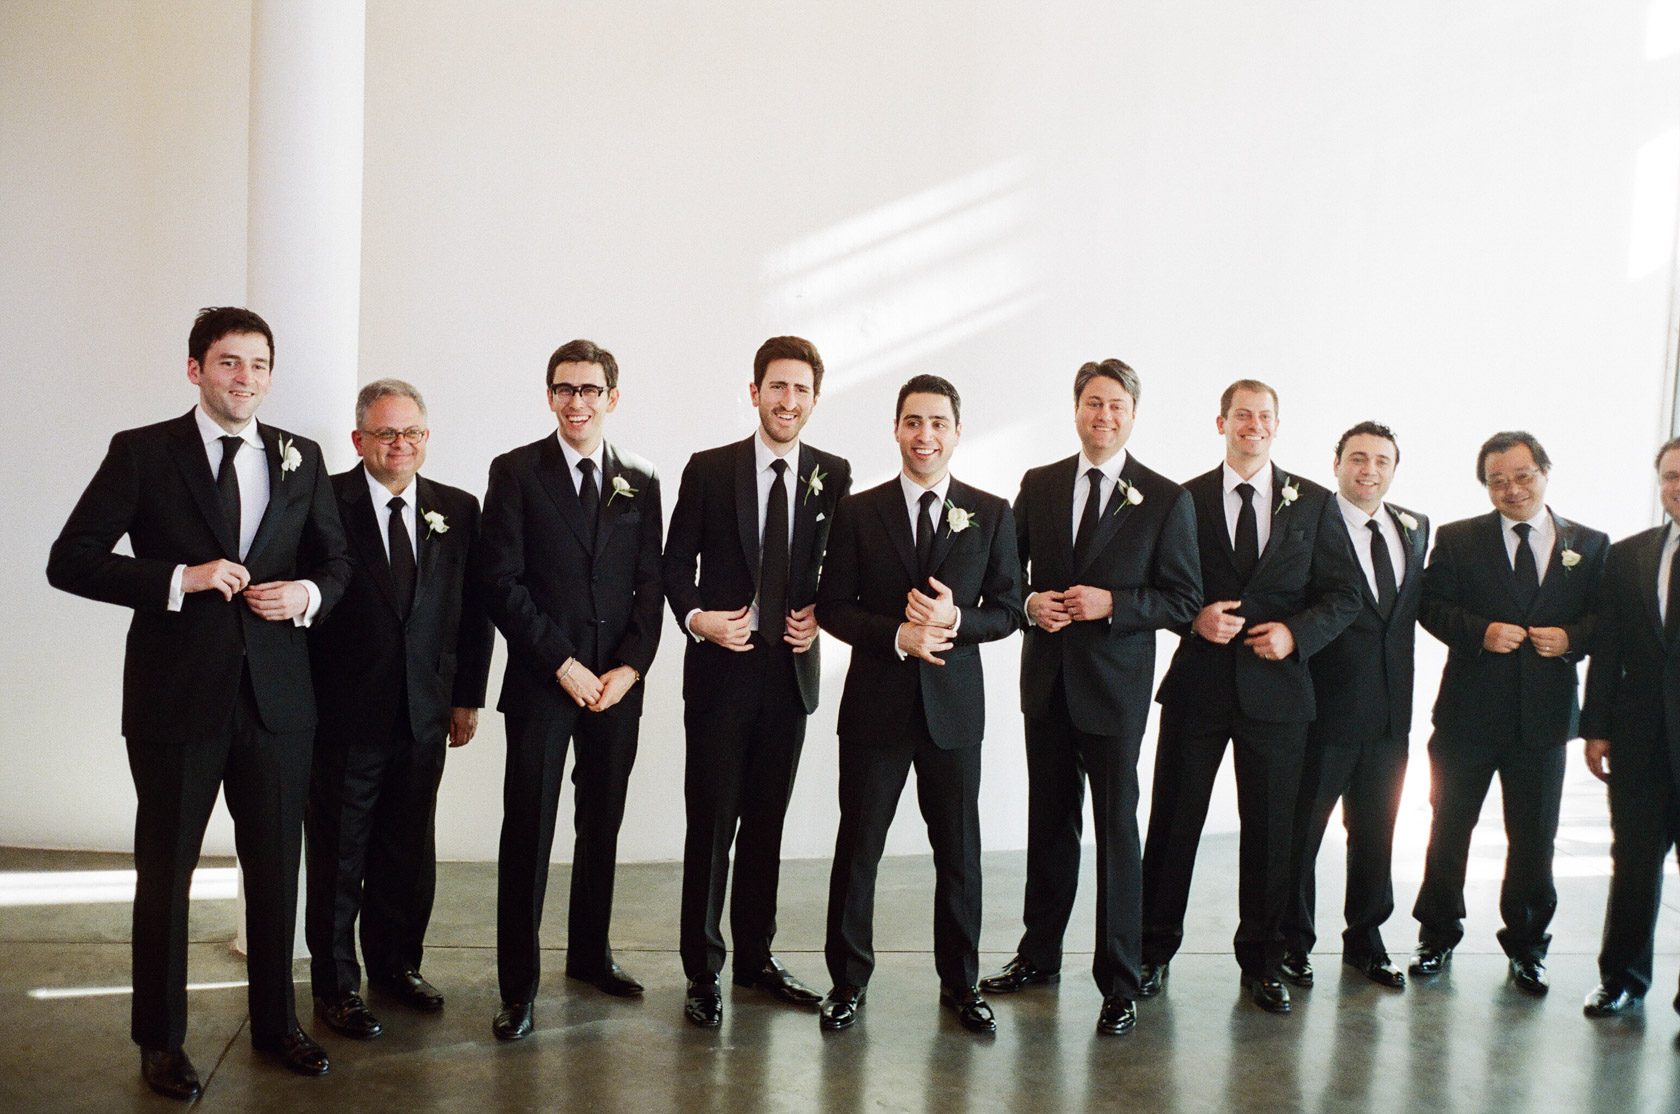 new orleans wedding groomsmen on film at cac - 07